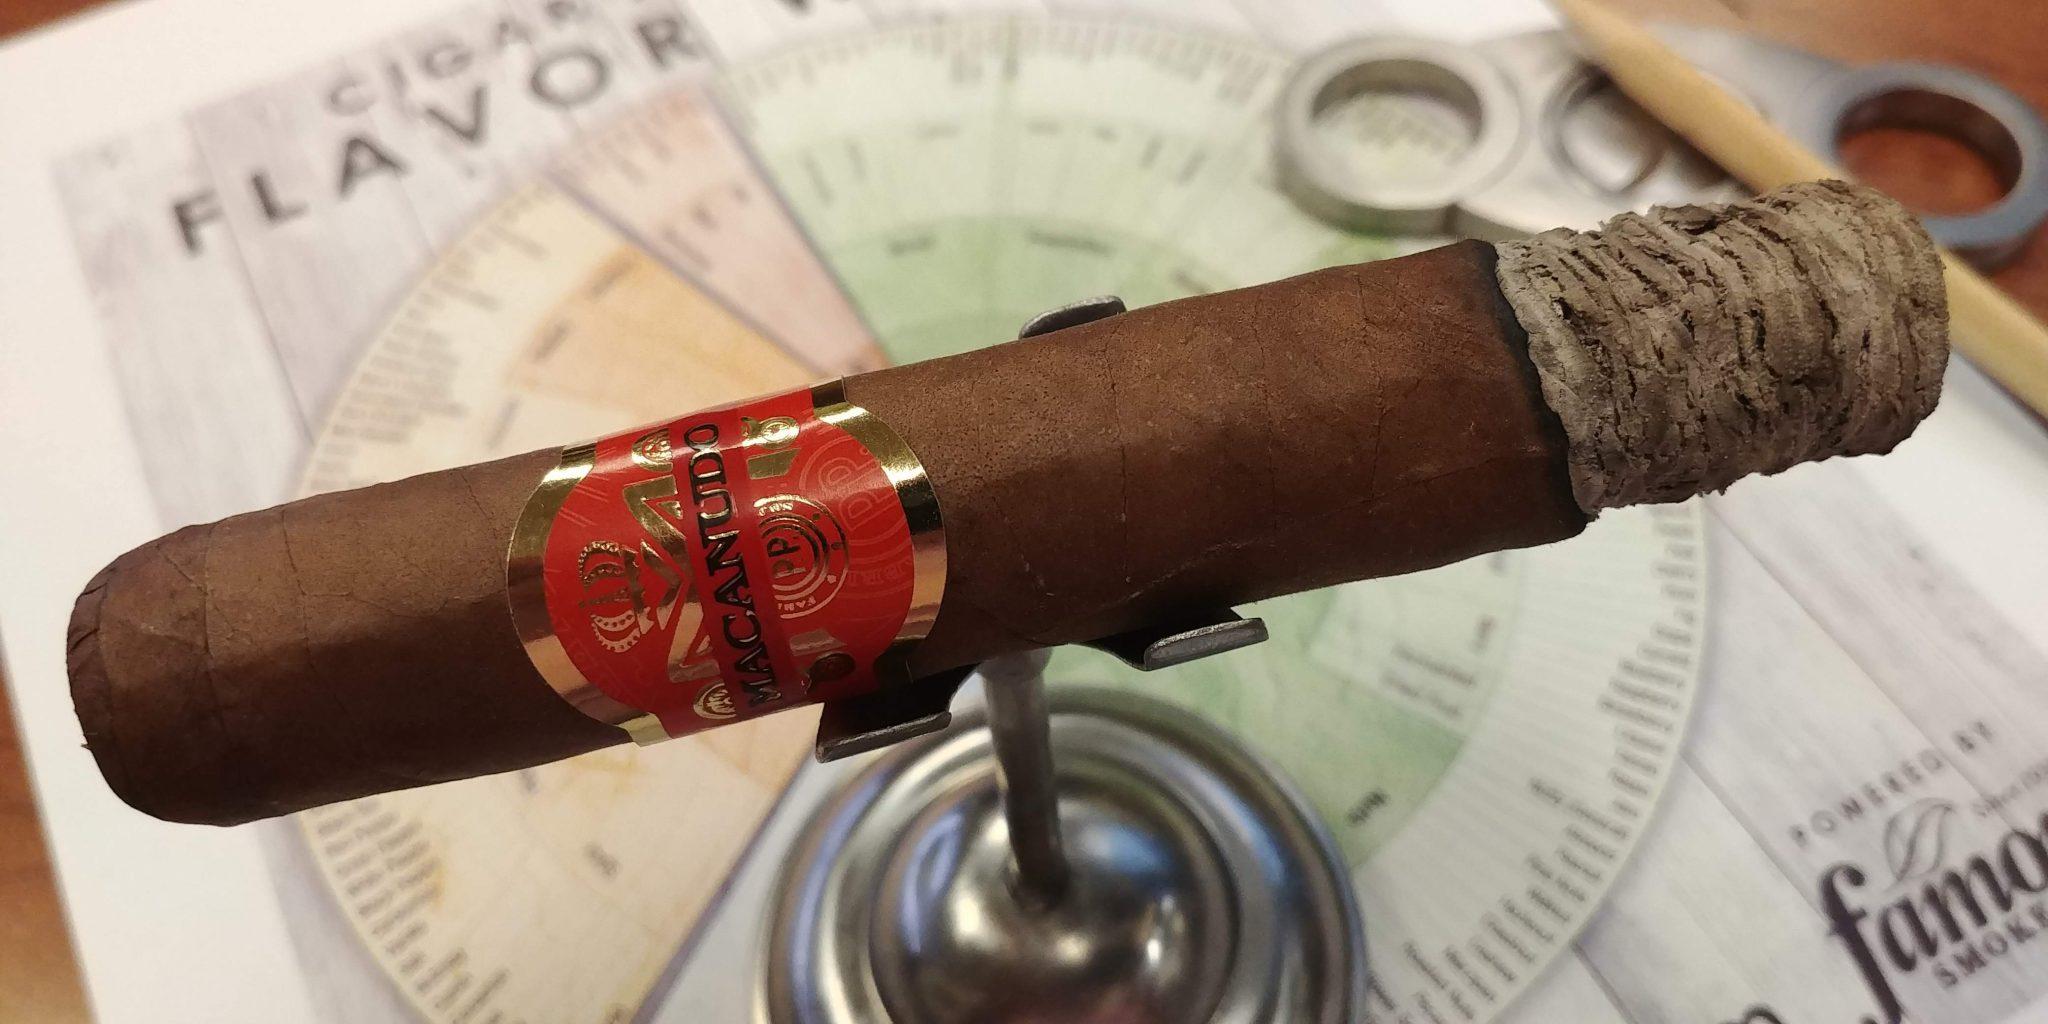 macanudo cigars guide macanudo inspirado orange cigar review Robusto by John Pullo